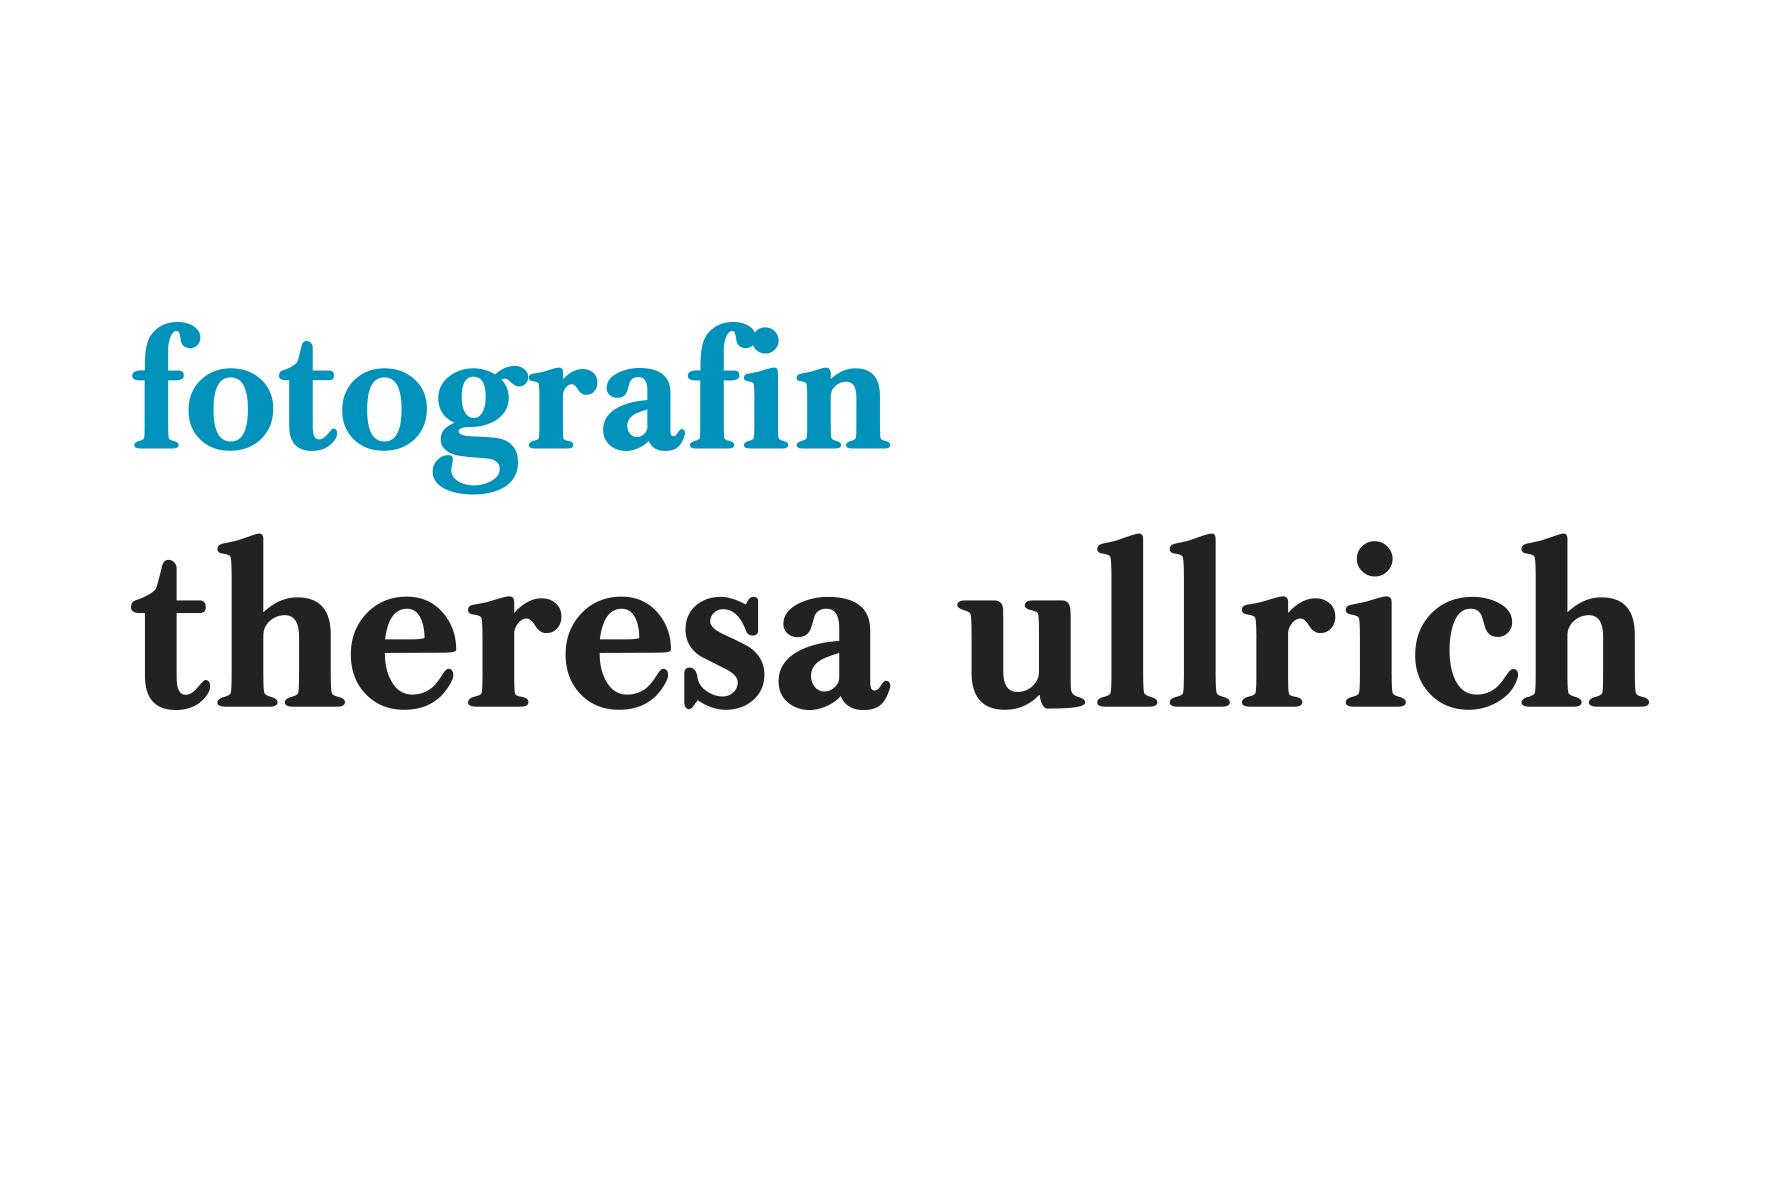 fotografin theresa ullrich